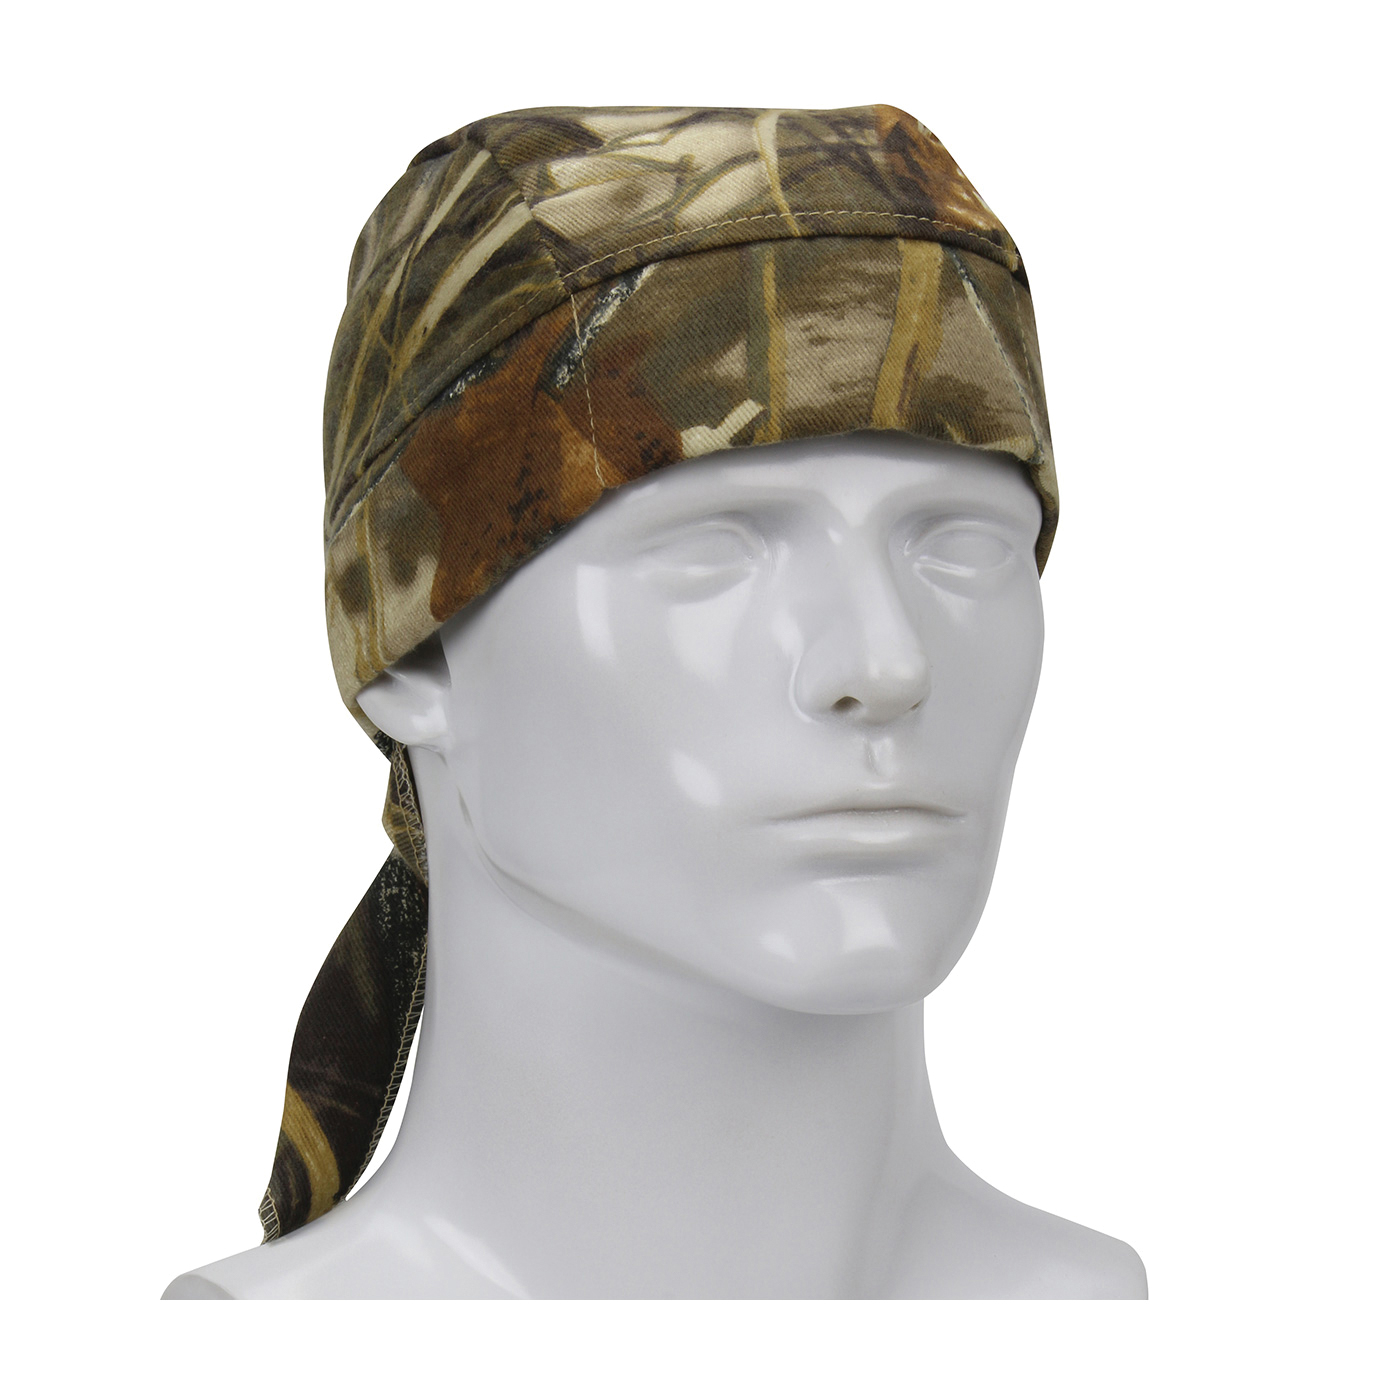 PIP® EZ-Cool® Plus 396-EZ205-RTC Evaporative Cooling Cooling Tie Hat, Universal, Realtree® Camo, Polyester Mesh, Tie Closure